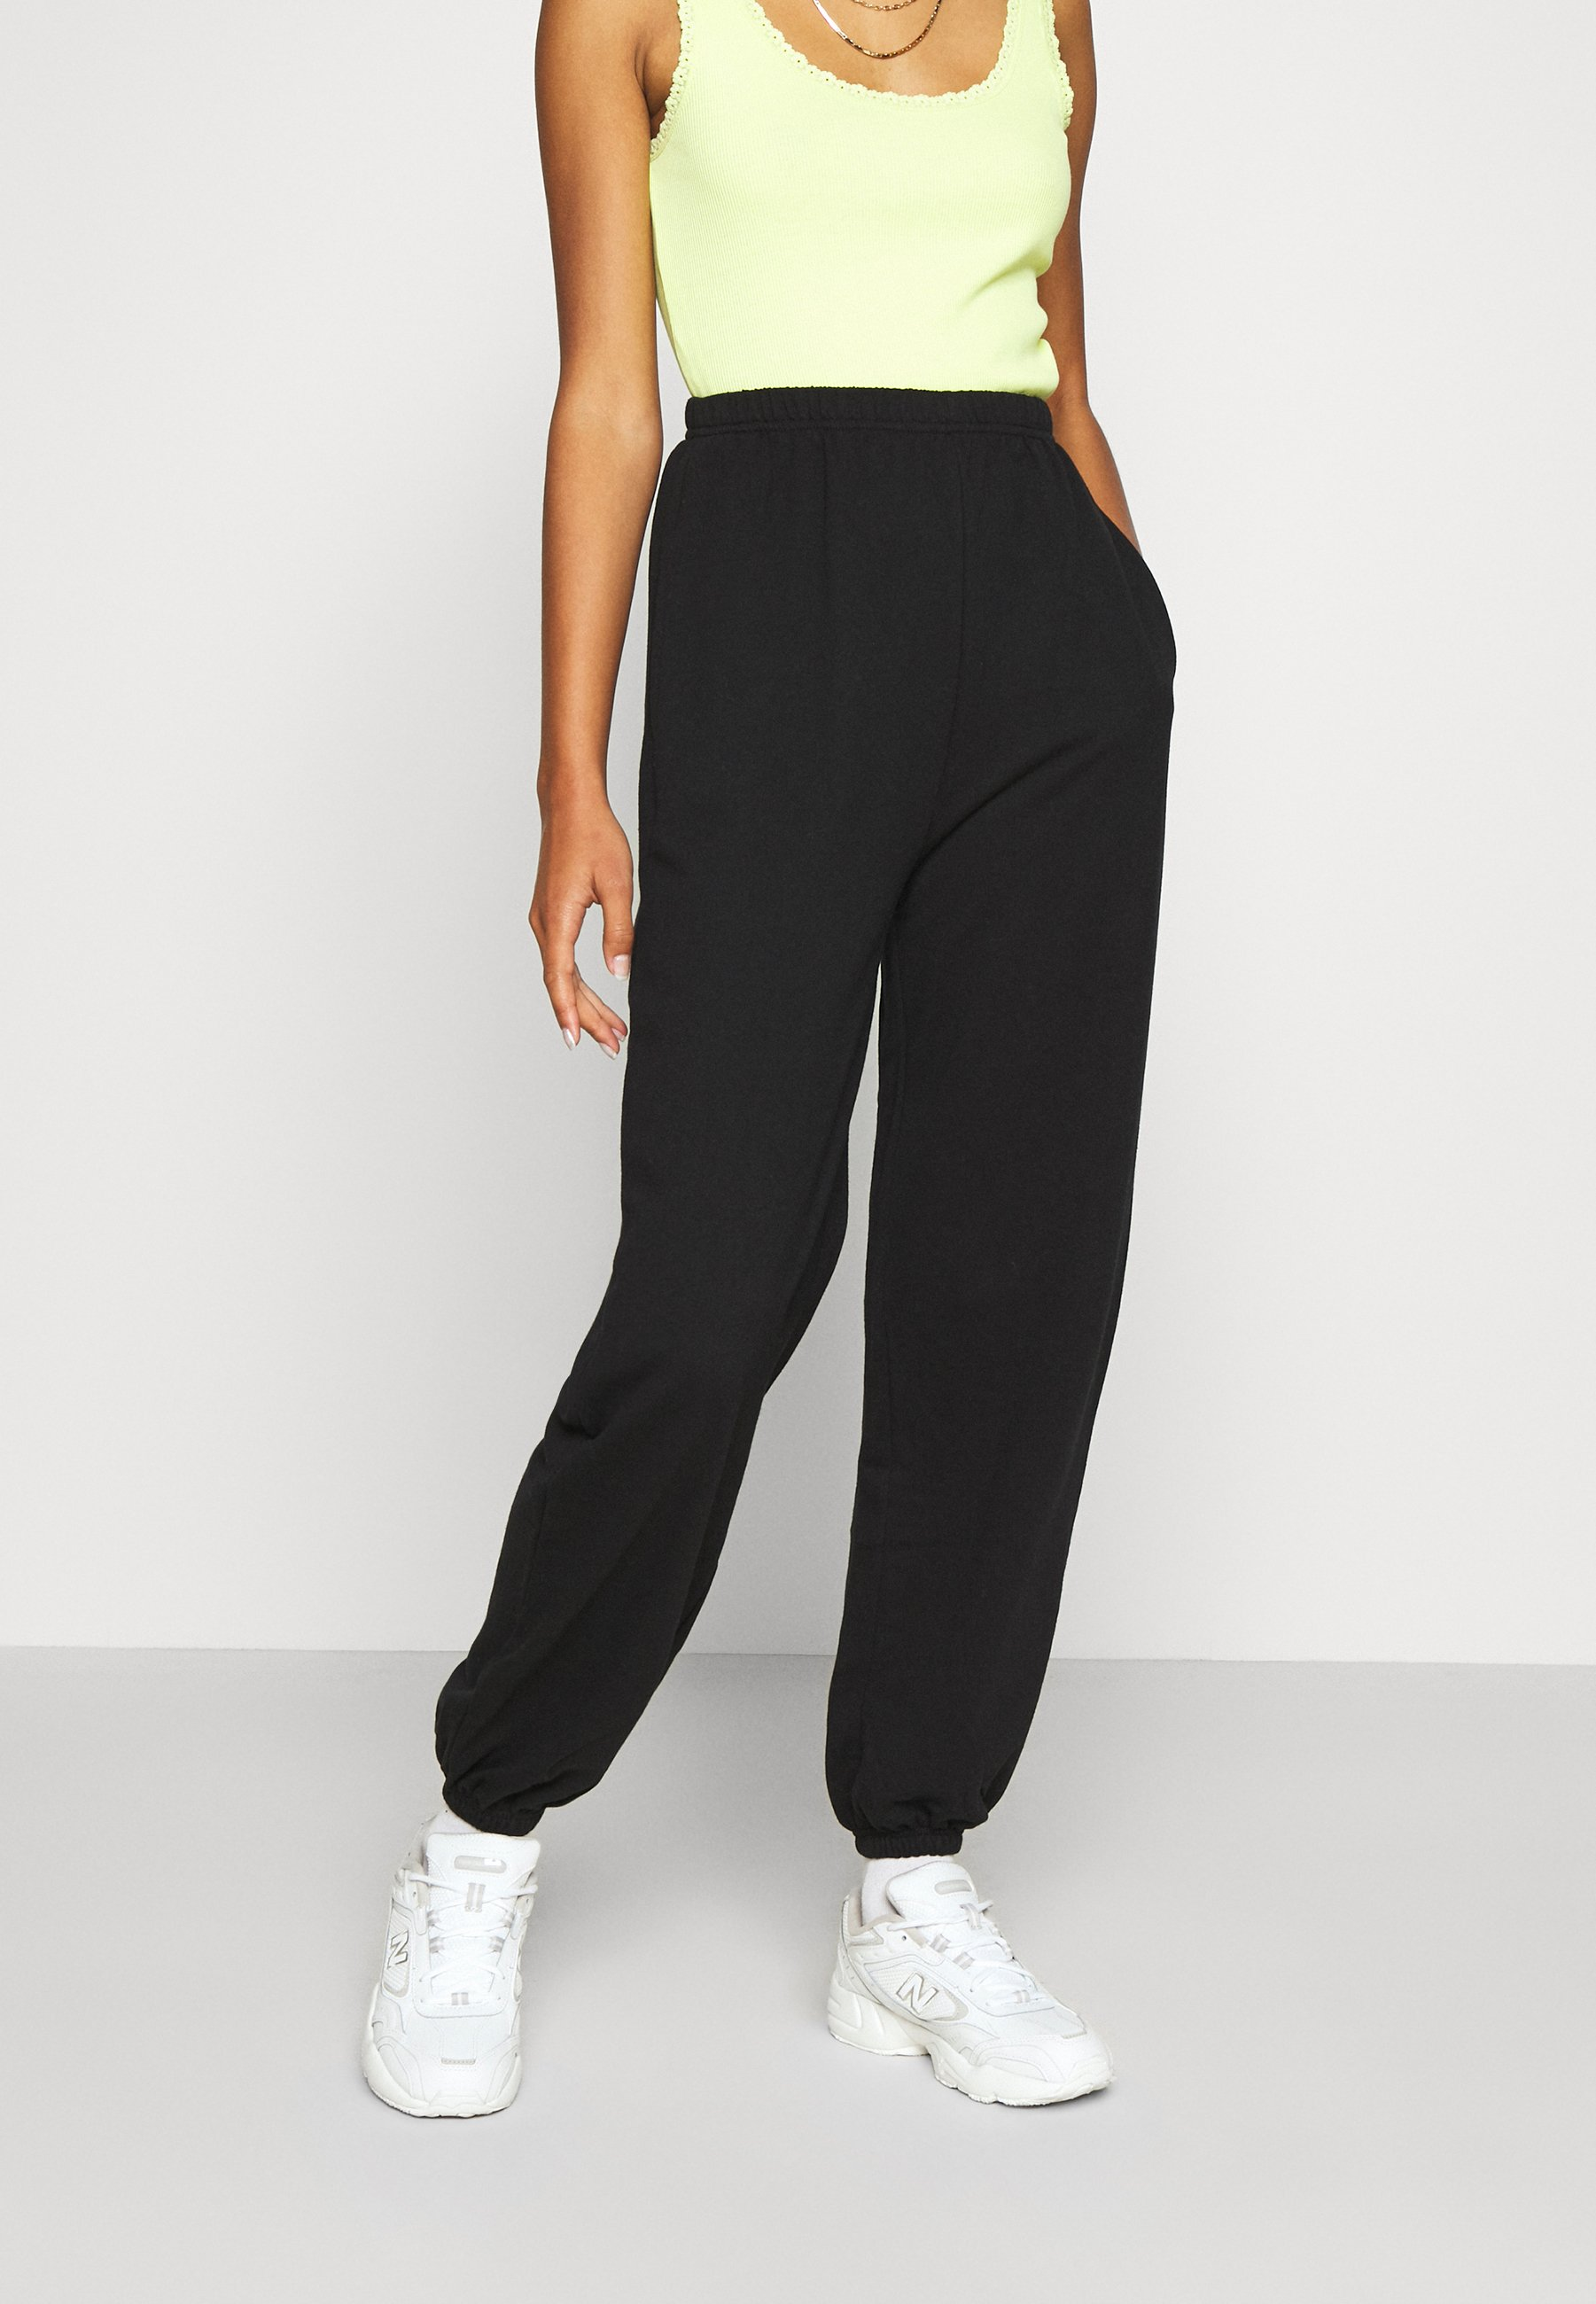 Damen Loose fit tracksuit bottoms - Jogginghose